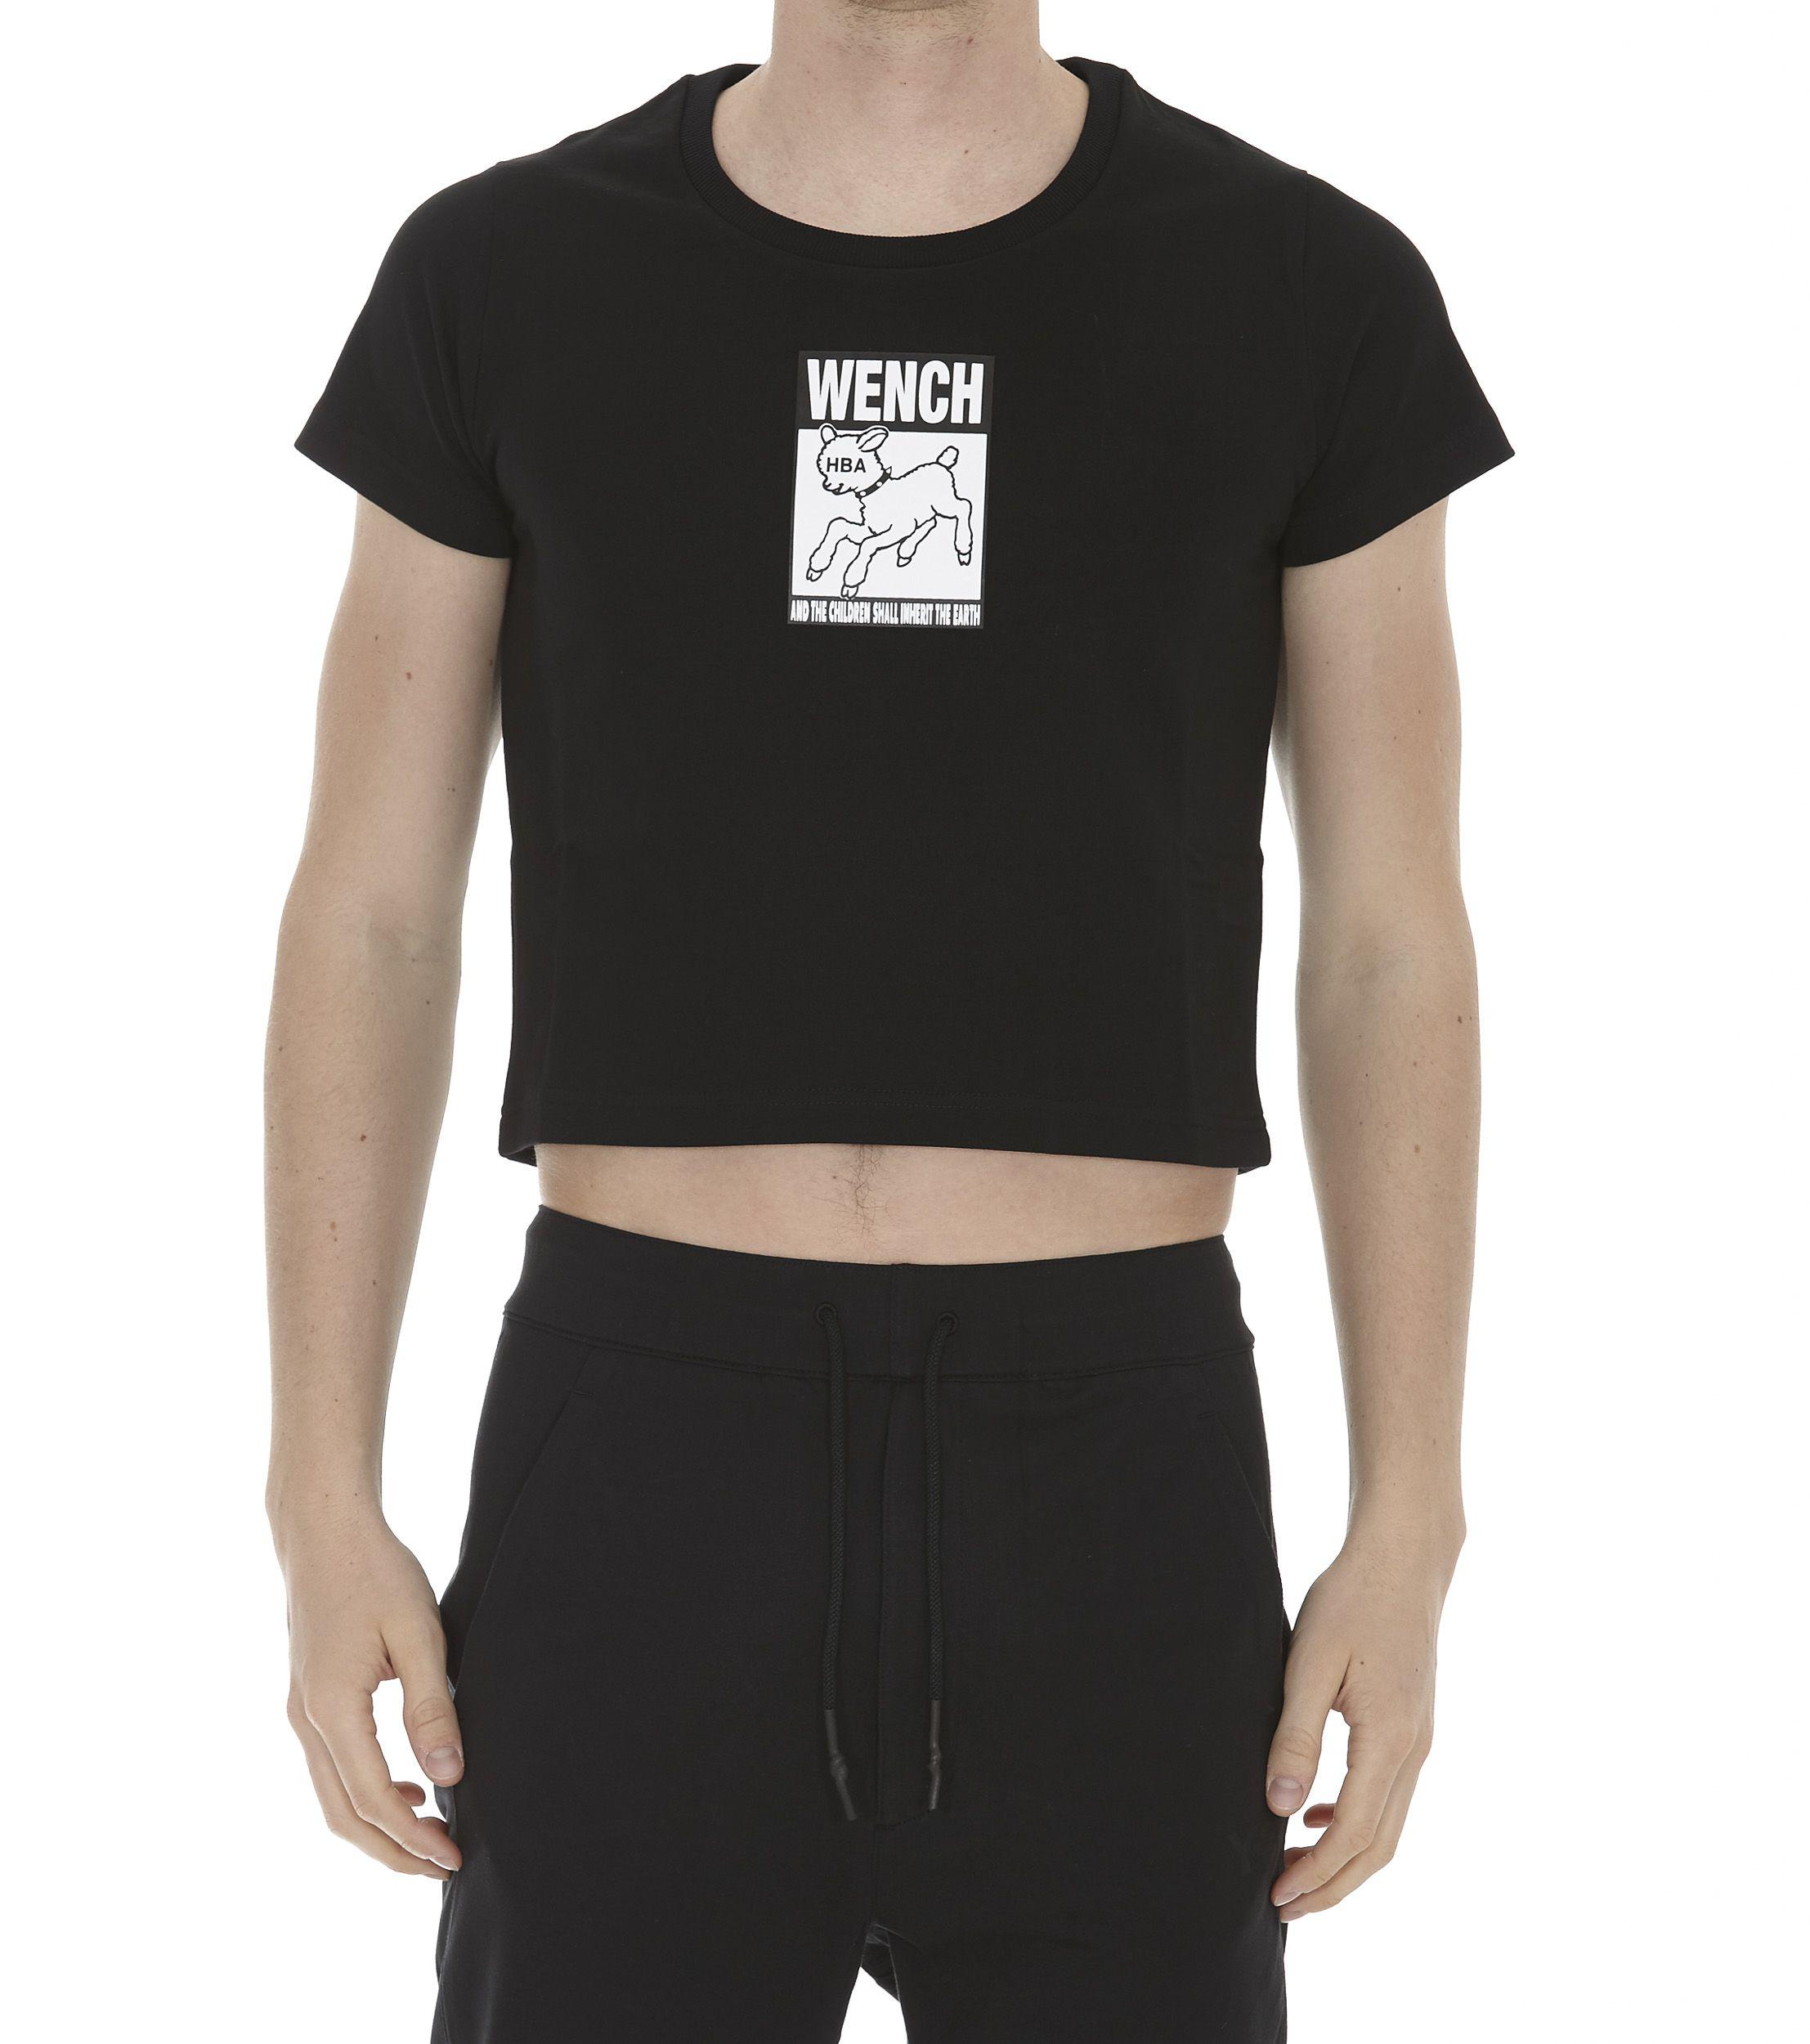 Hba Hood By Air Tshirt